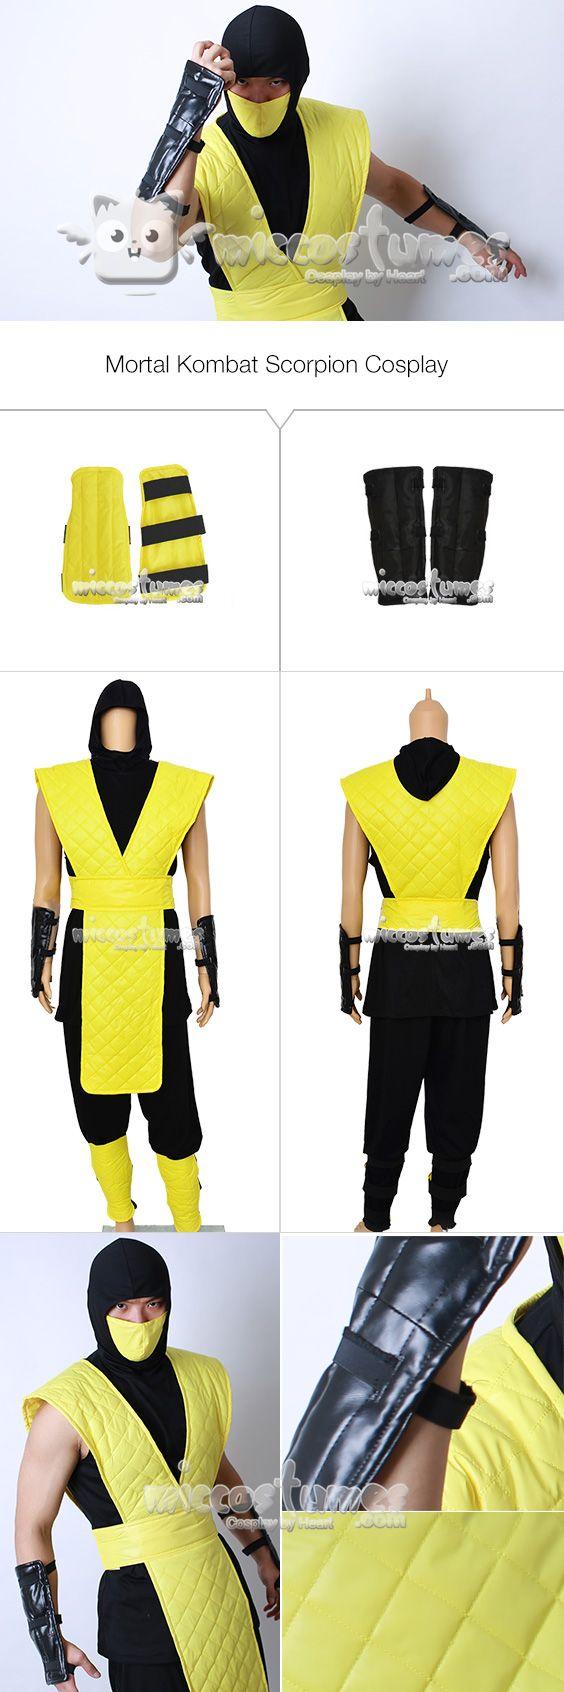 More details of Mortal Kombat Scorpion Cosplay Costume  #miccostumes #cosplay #mortalkombat #scorpion #cosplaycostumes  #hanzohasashi #ninja